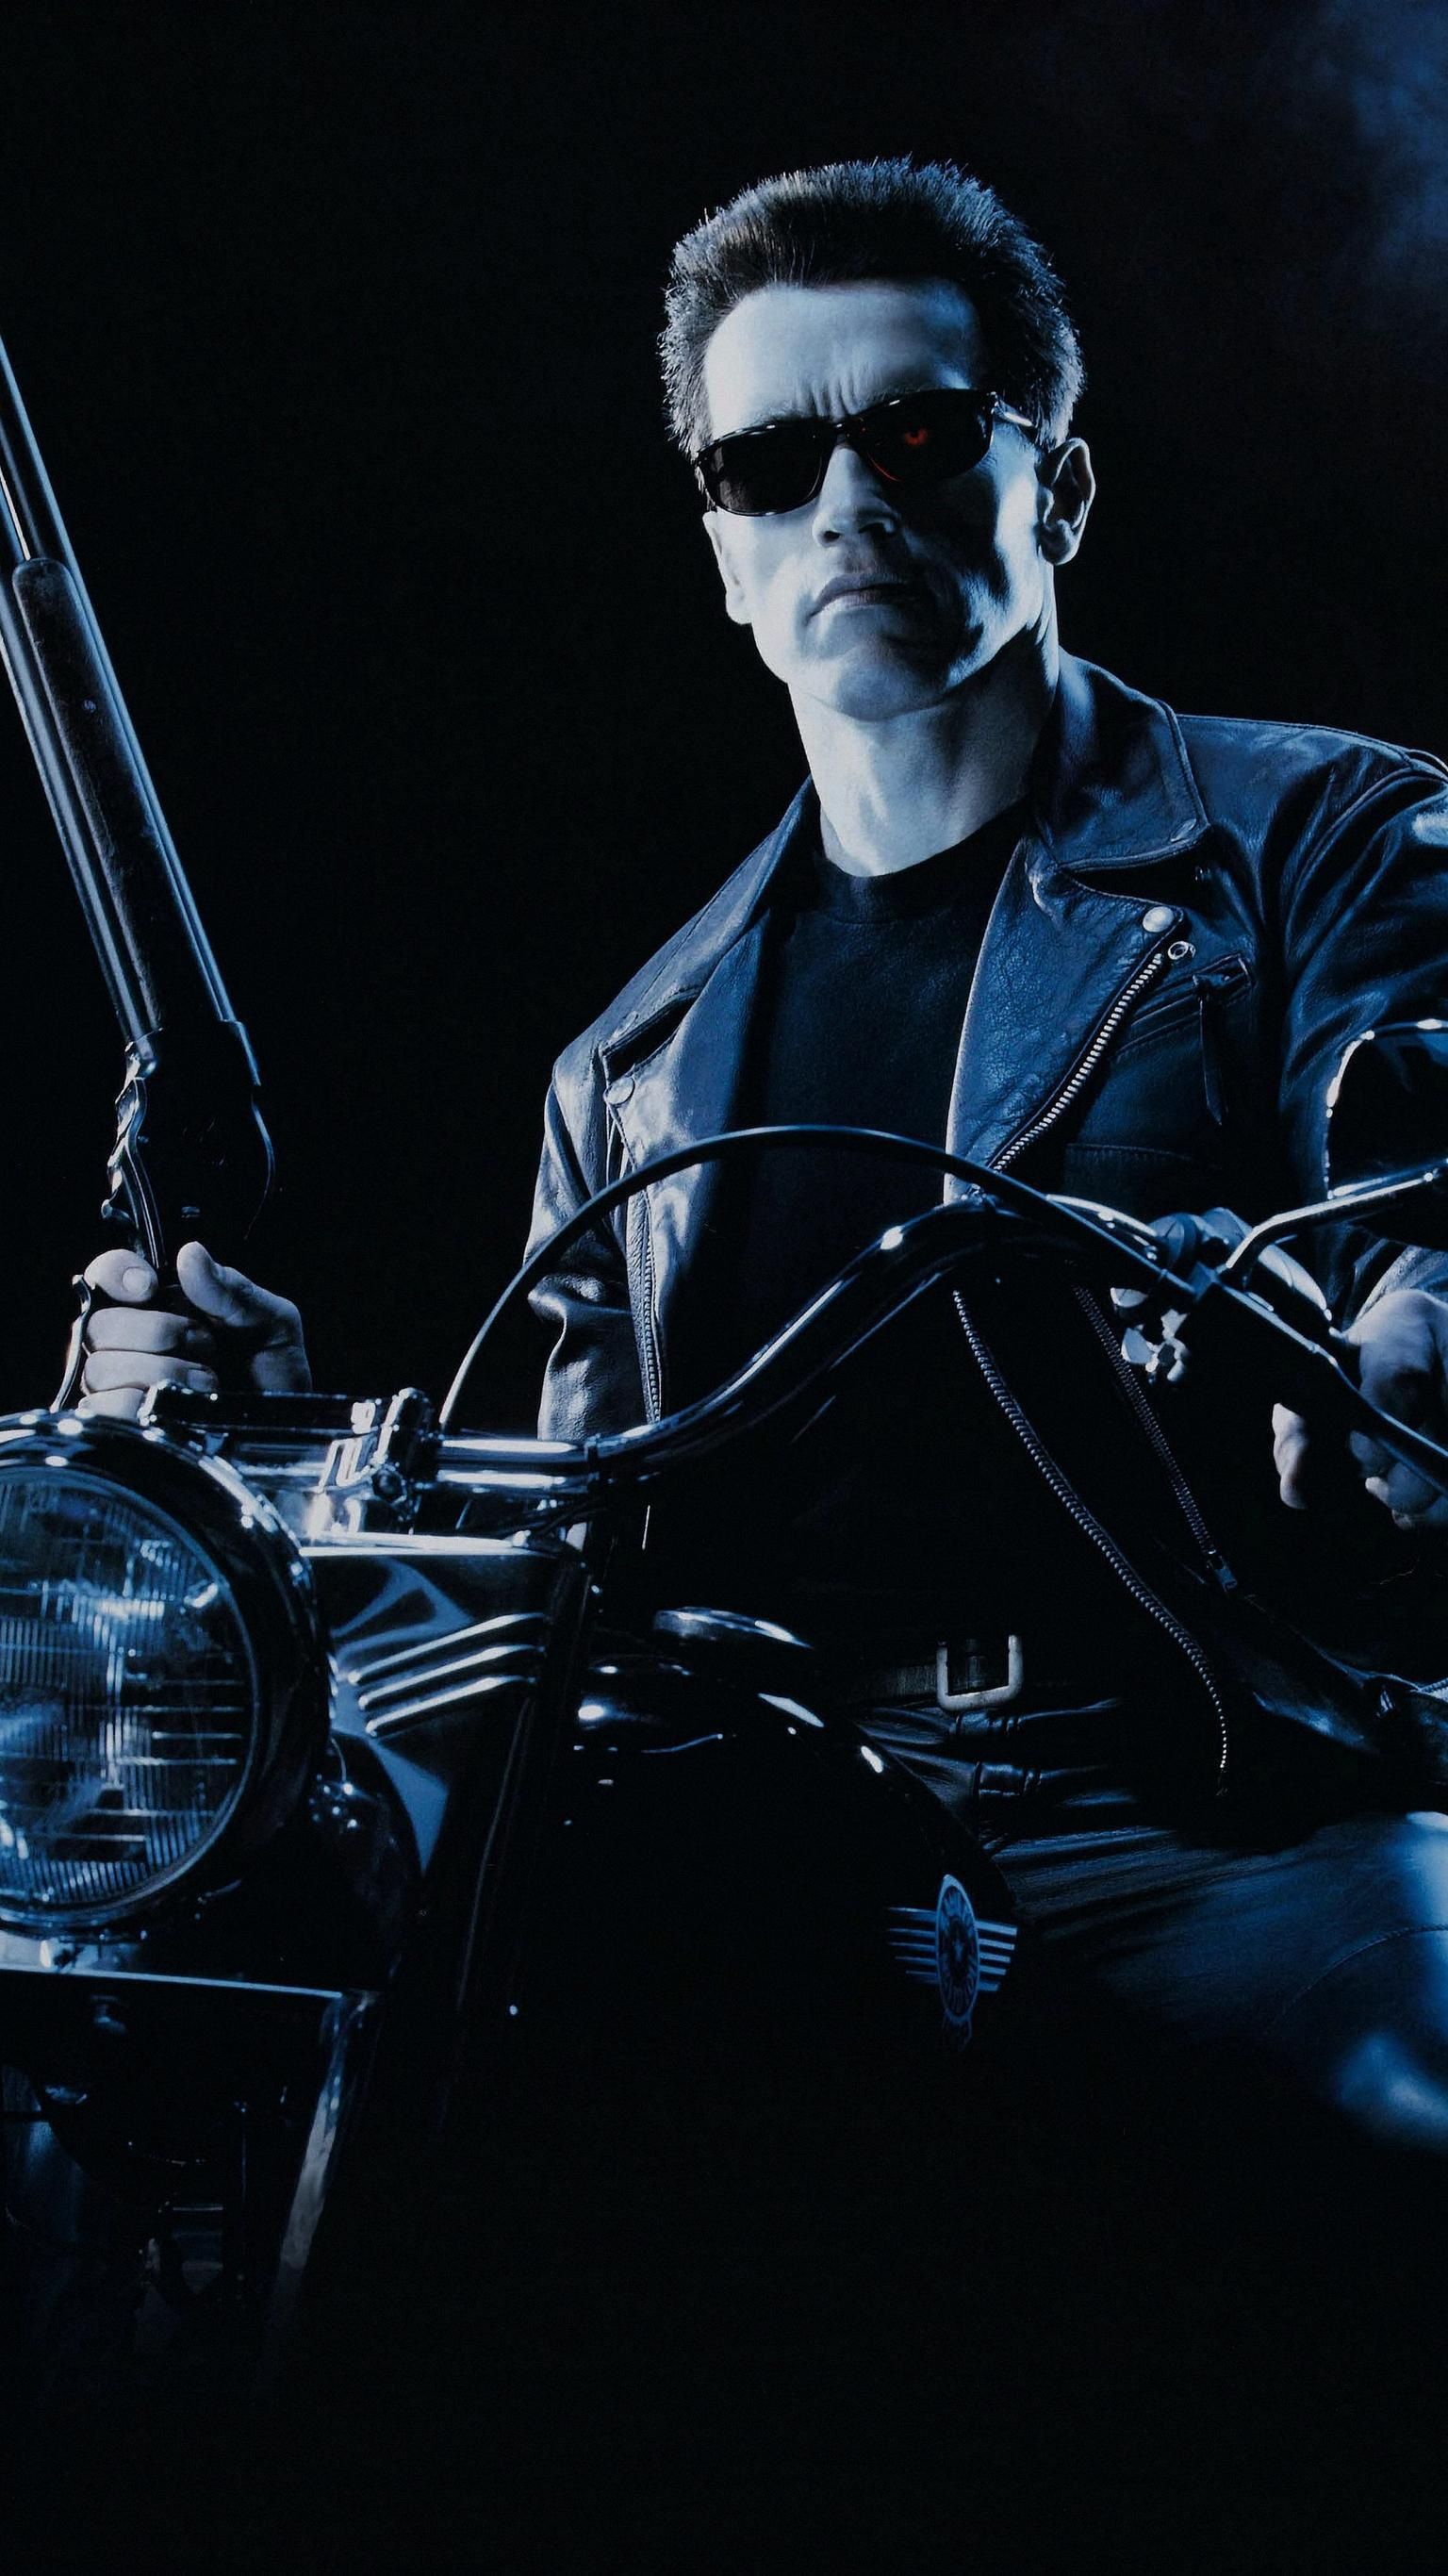 Terminator 6 wallpapers wallpaper cave - Terminator 2 wallpaper hd ...